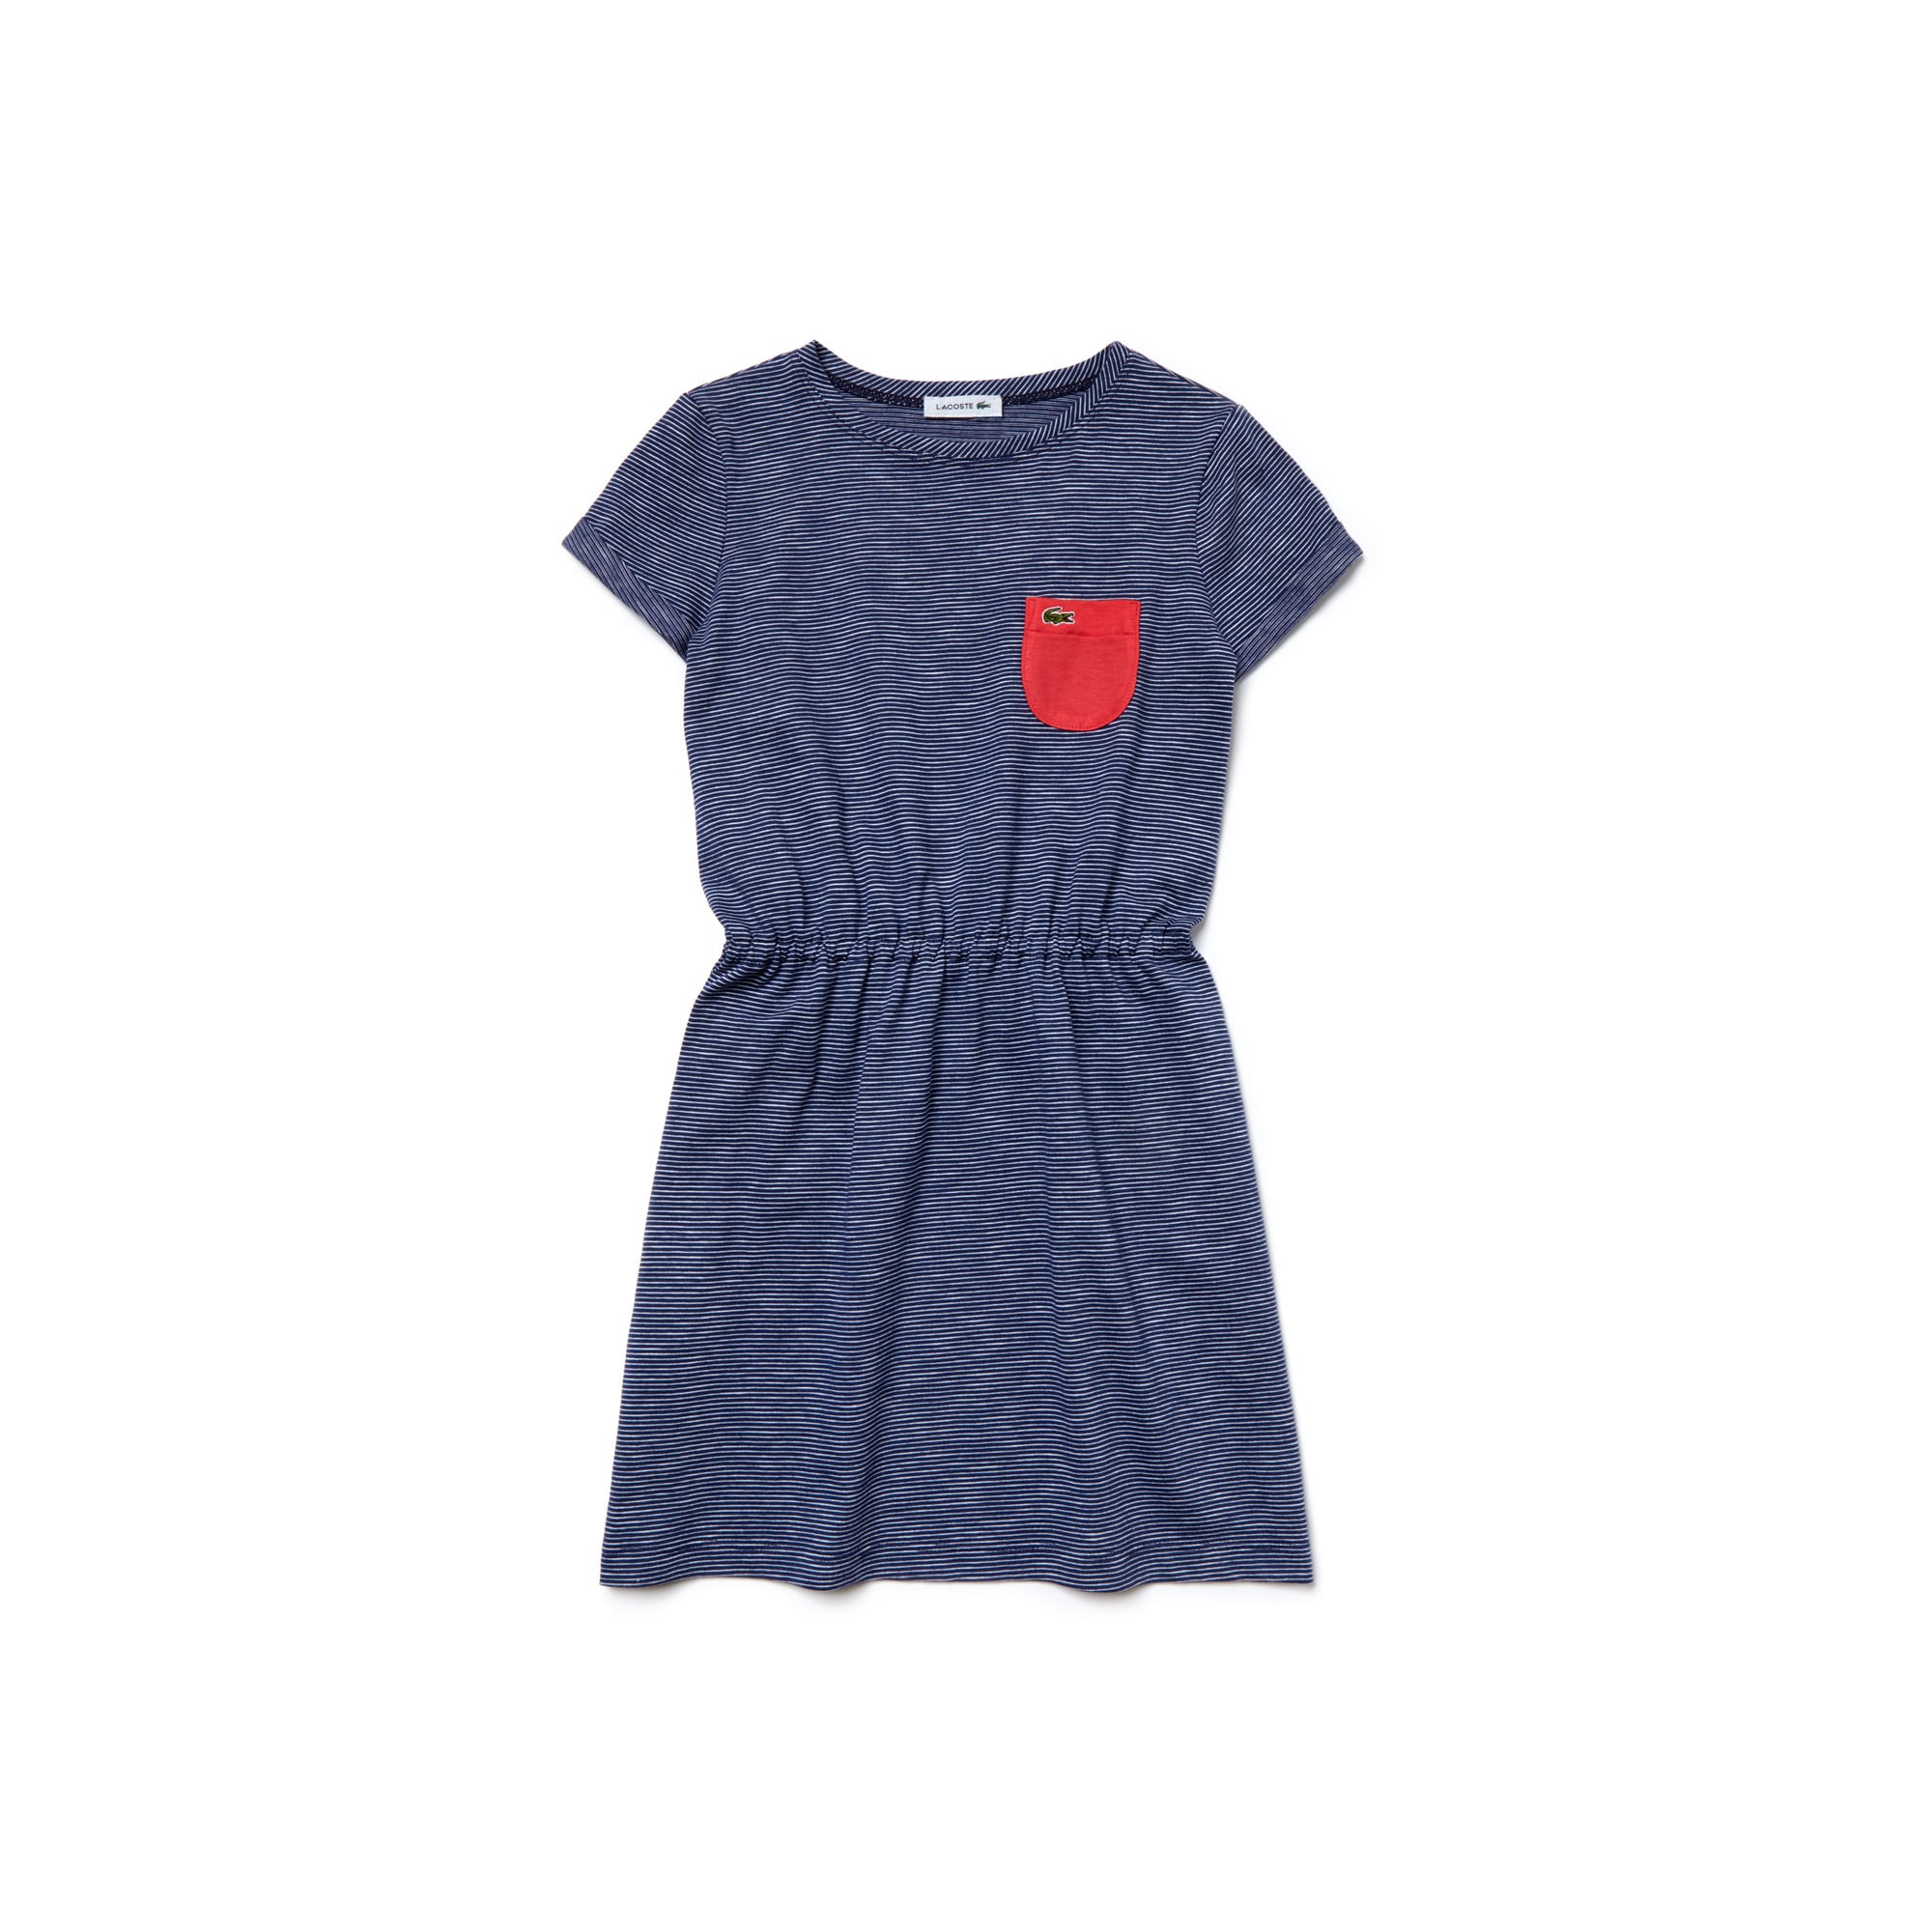 Girl's Contrast Pocket Striped Jersey Dress